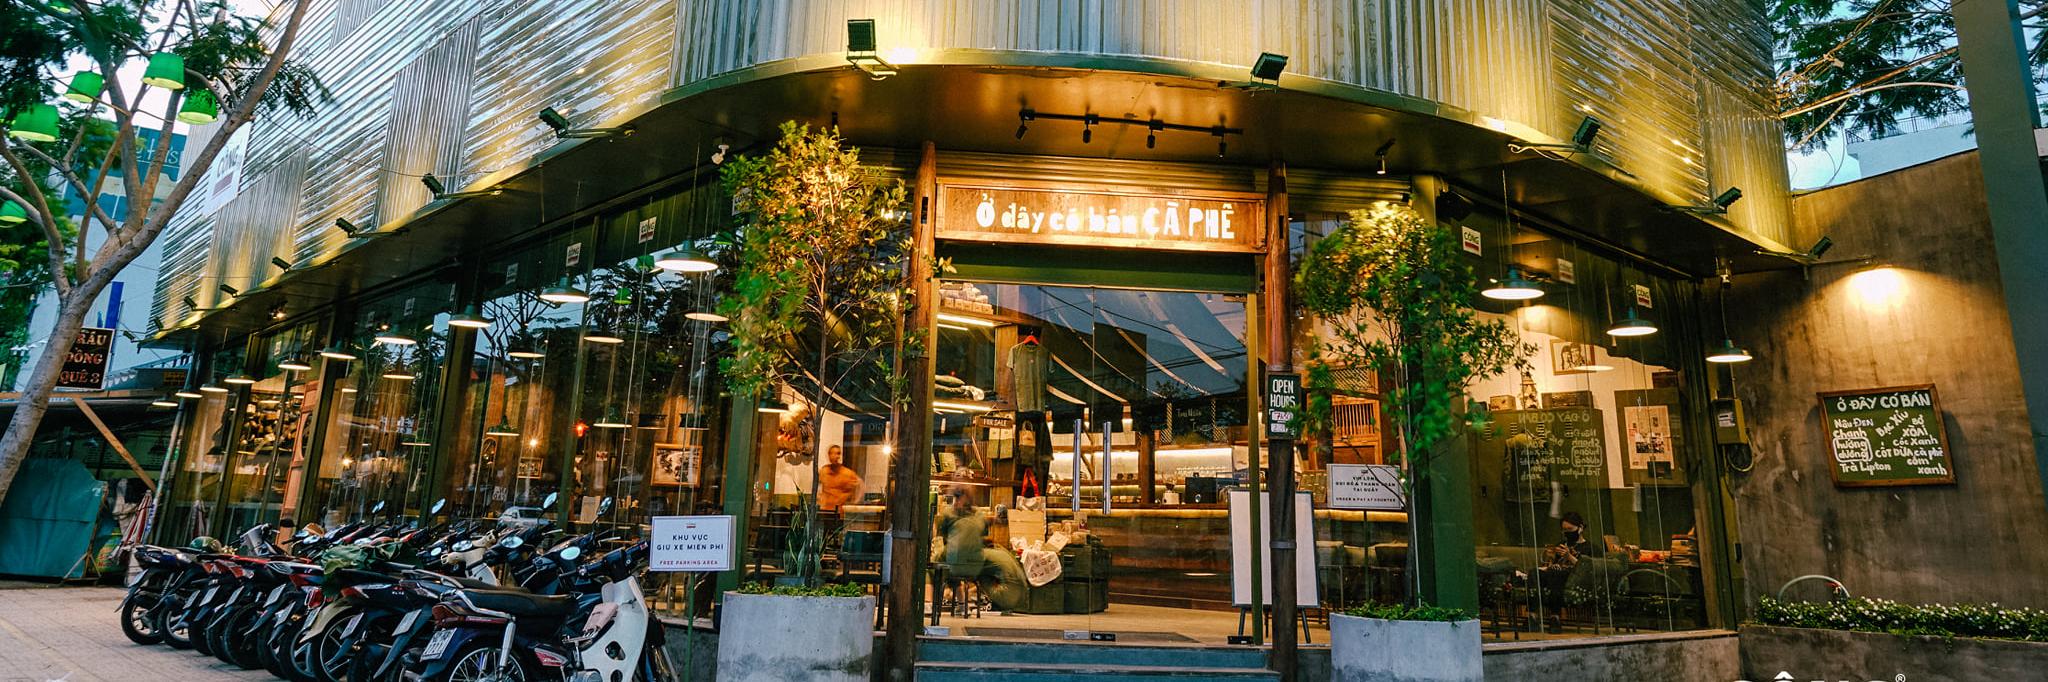 https://gody.vn/blog/phuonganh6069/post/goi-y-9-quan-cafe-mo-cua-xuyen-tet-o-ha-noi-dip-dau-nam-8079